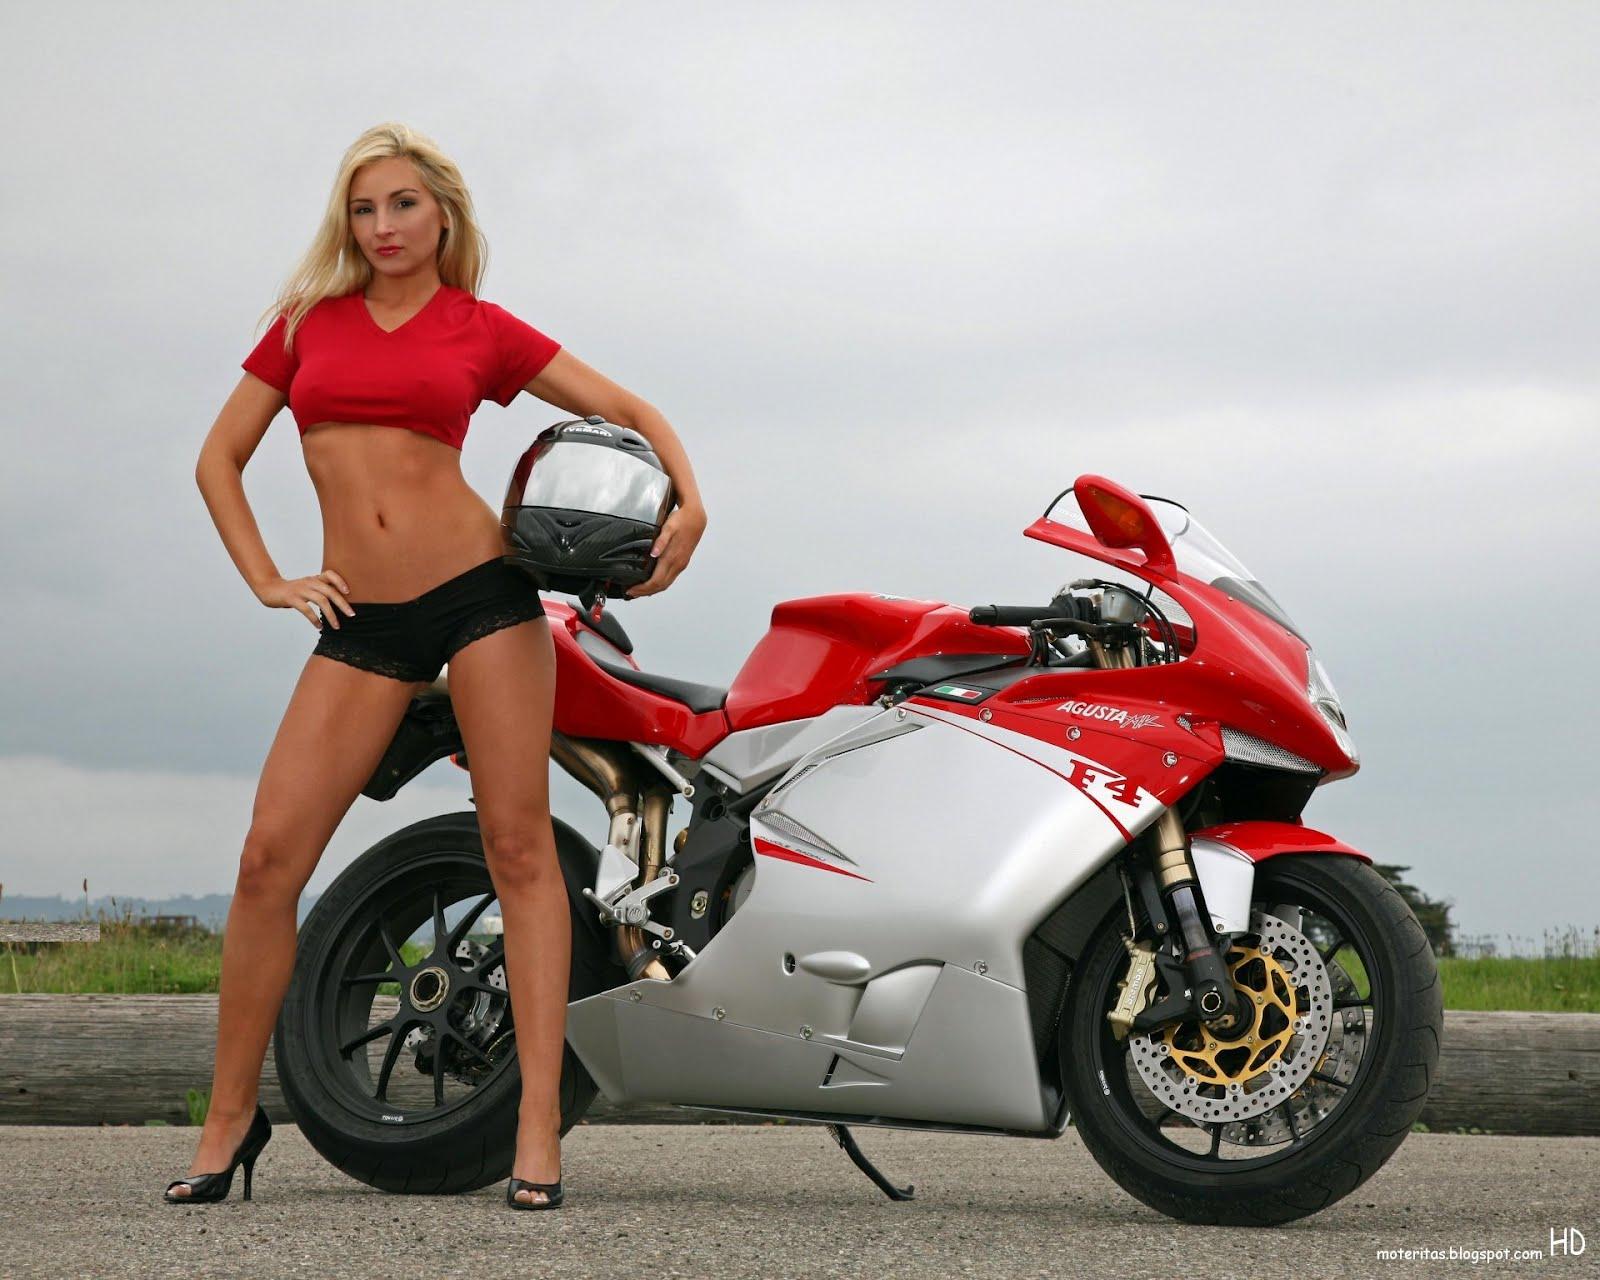 http://1.bp.blogspot.com/--6-L3PndGvE/T1ojSKqMkmI/AAAAAAAAAtE/E3d267doFbs/s1600/blonde_biker_mv_agusta_motos_deportiva_pistera_chava_f4_diosa_walpapers_hd_456%2B%255Bmoteritas.blogspot.com%255D.jpg